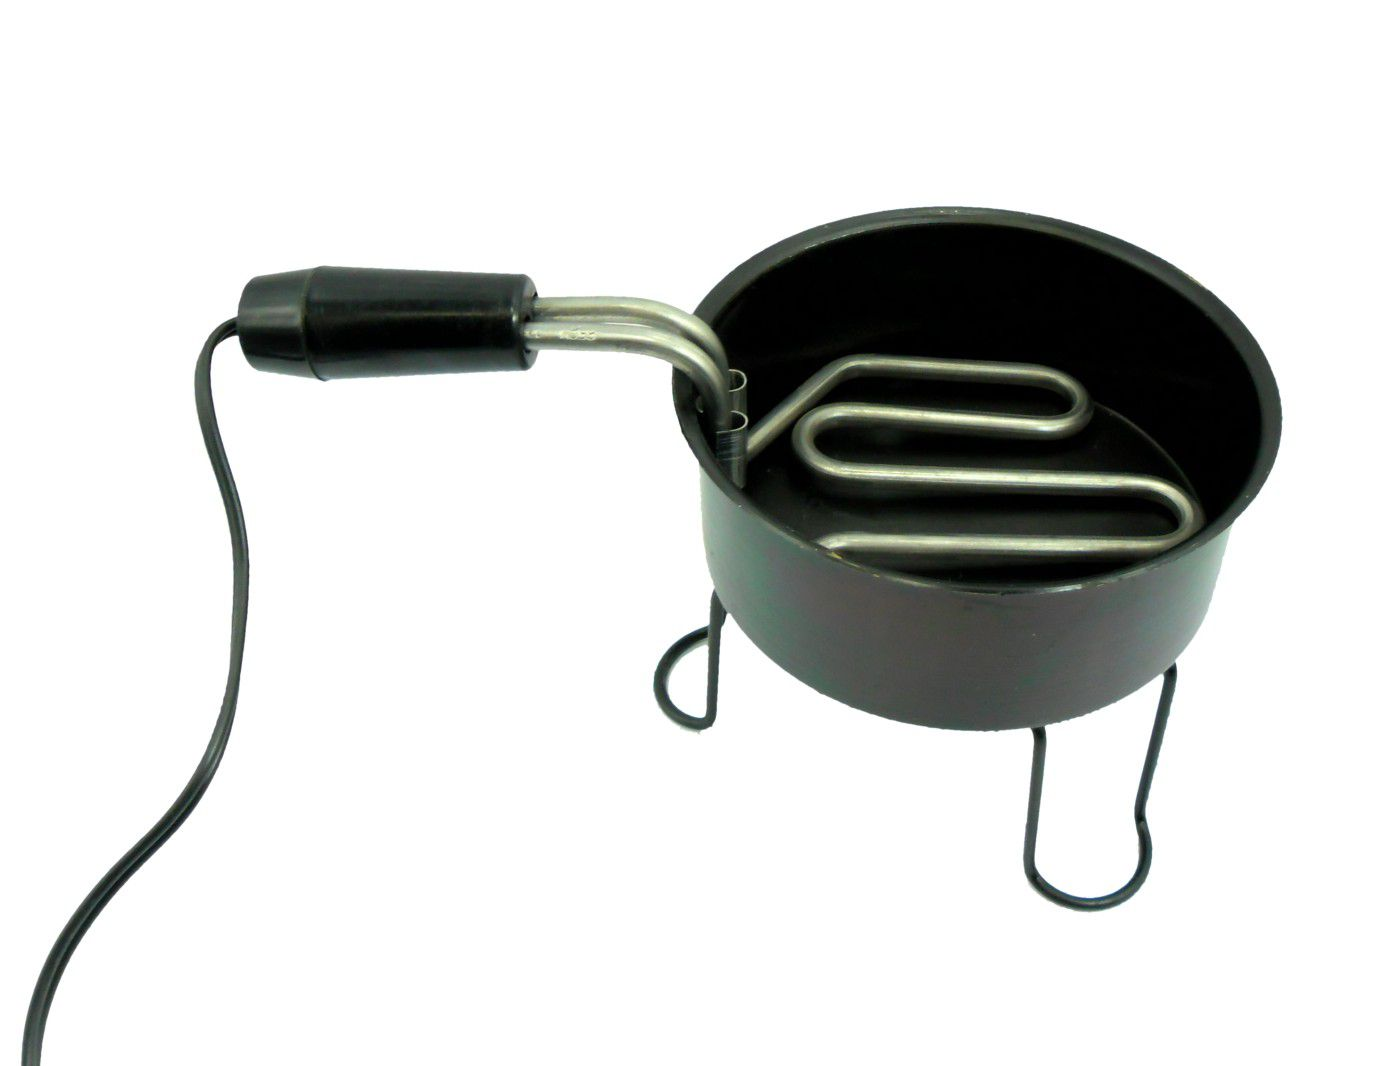 Controlador de calor (Kaloud) Yahya, Samsaris Vitria, mangueira c/piteira,fogareiro,pinça